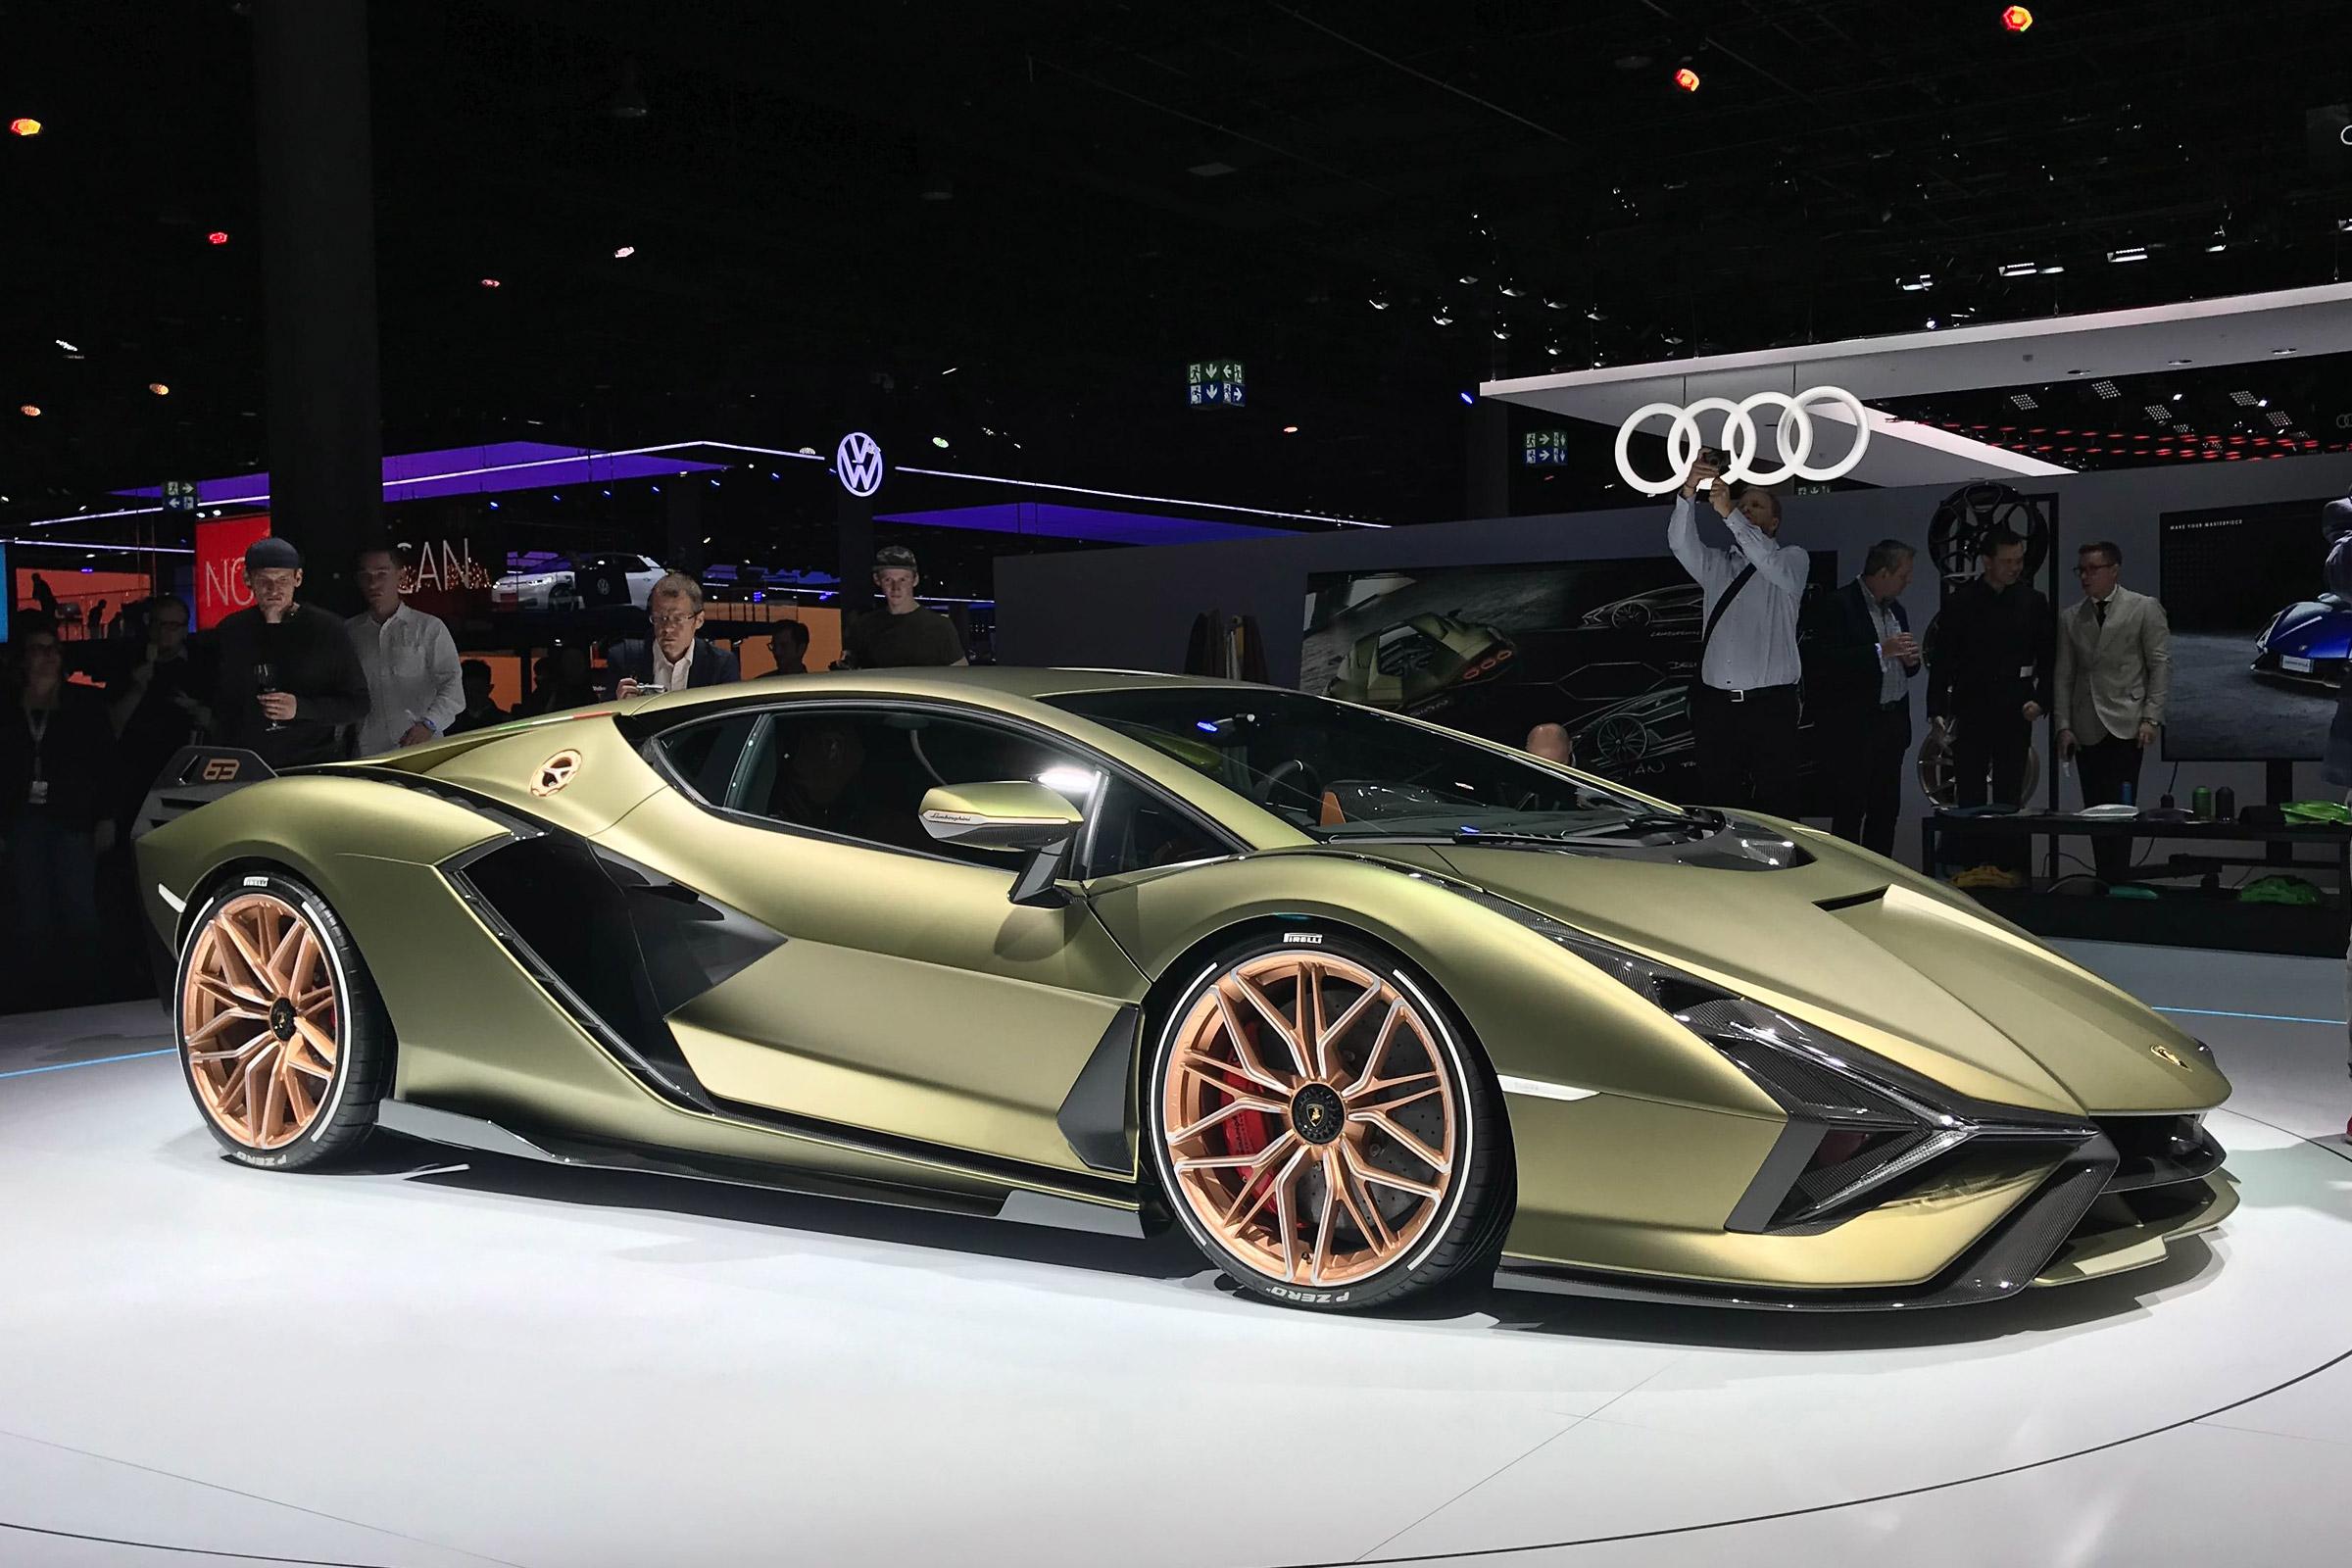 New Lamborghini Sian Most Powerful Lambo Yet Makes Frankfurt Debut Evo